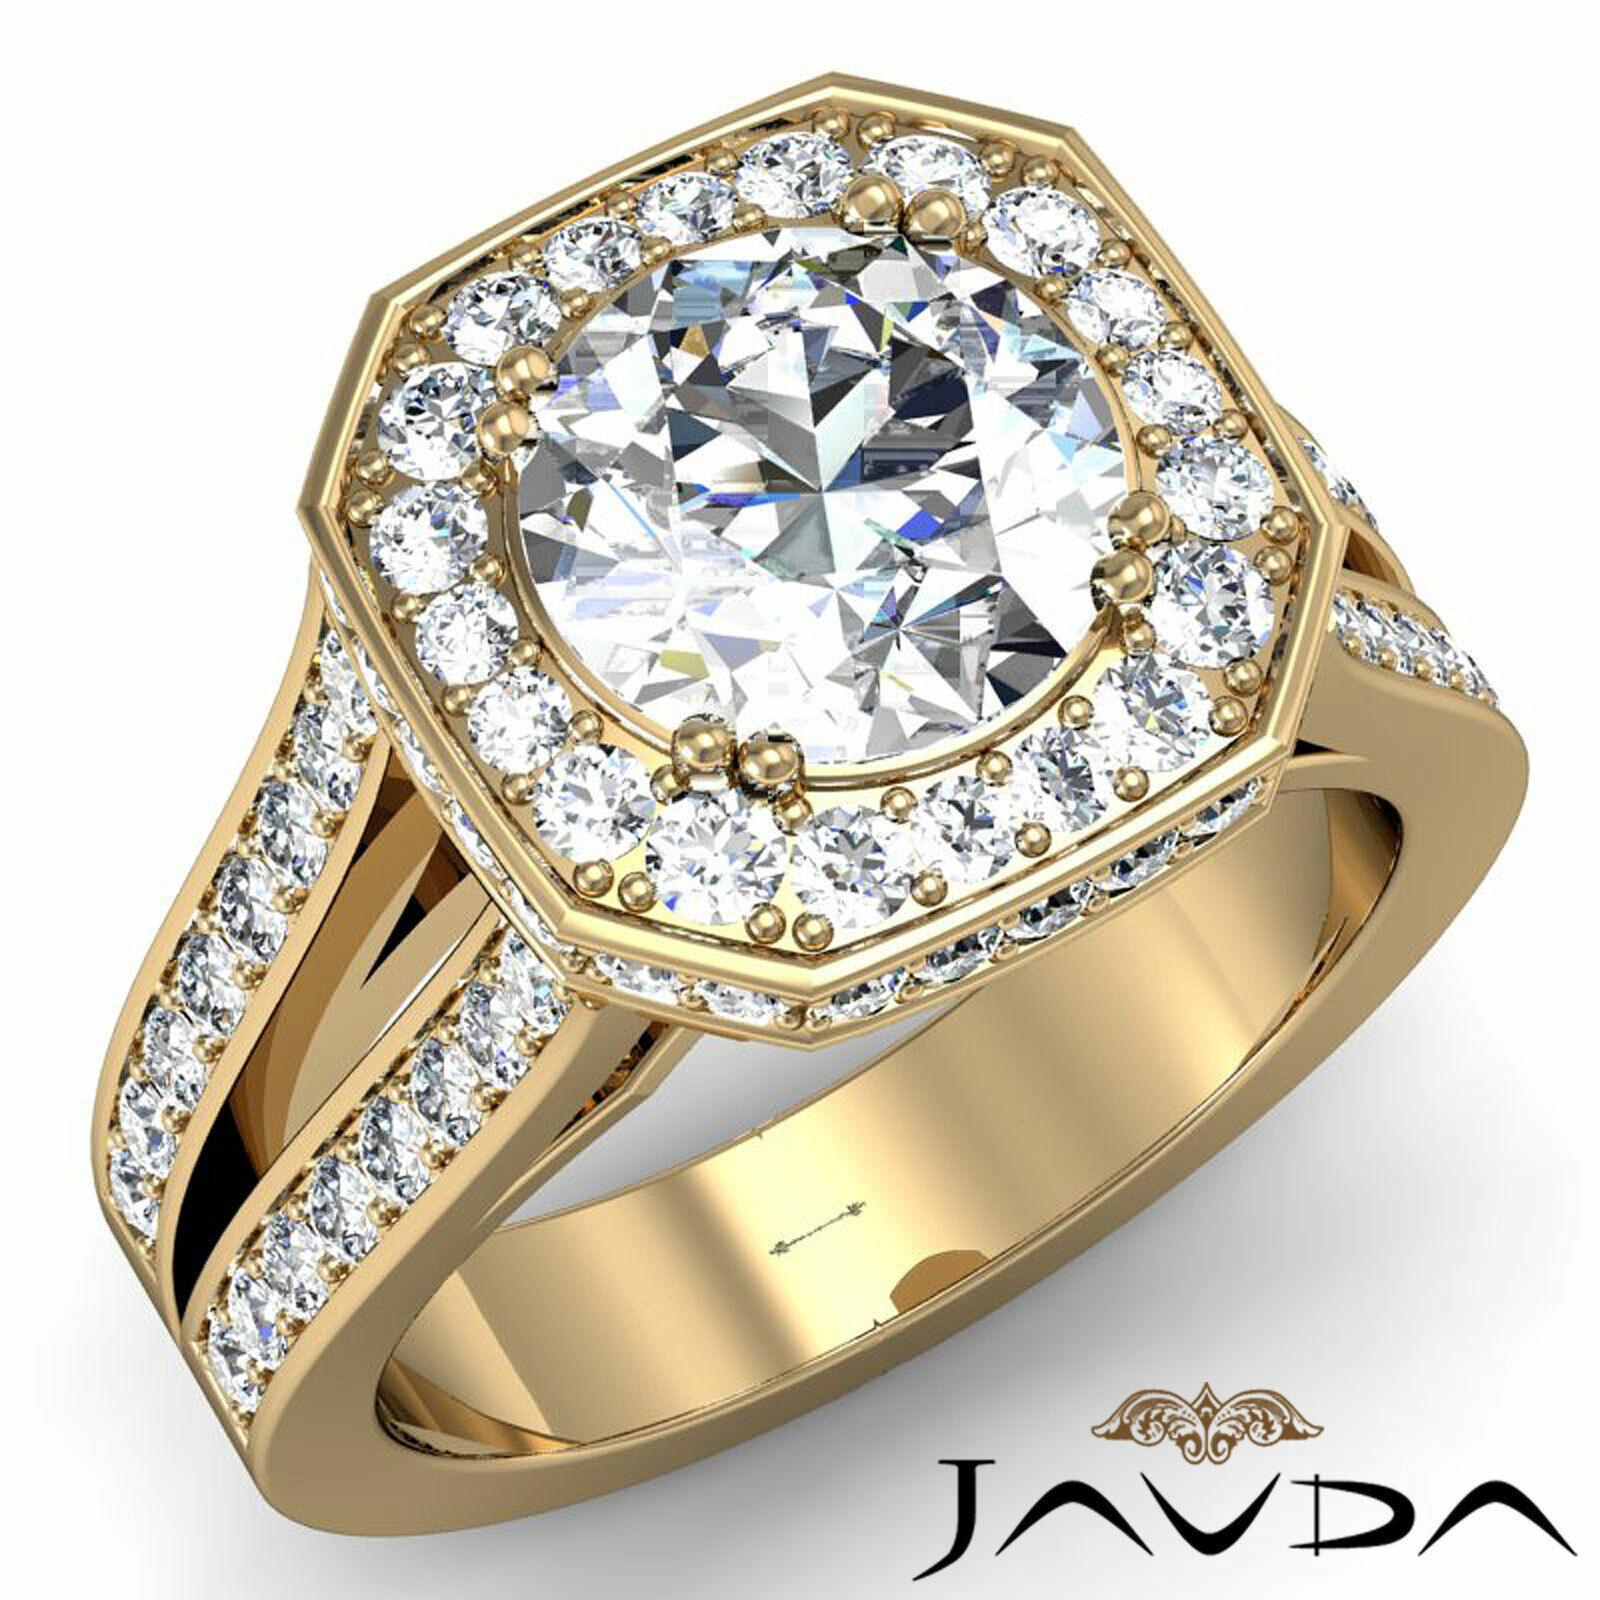 Hexagon Halo Split Shank Round Diamond Engagement Ring GIA F VS1 Clarity 2.84Ct 6